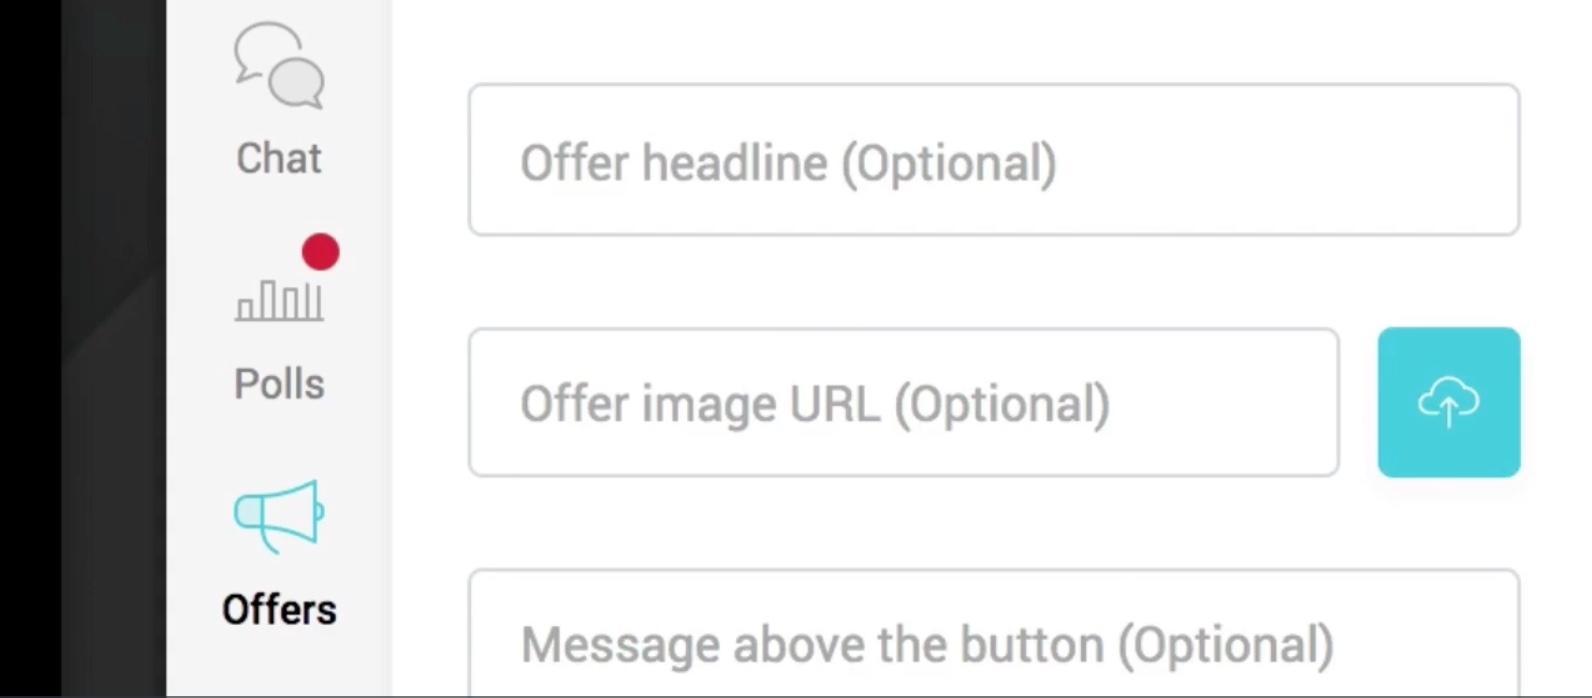 Webinar Paid Webinars Options